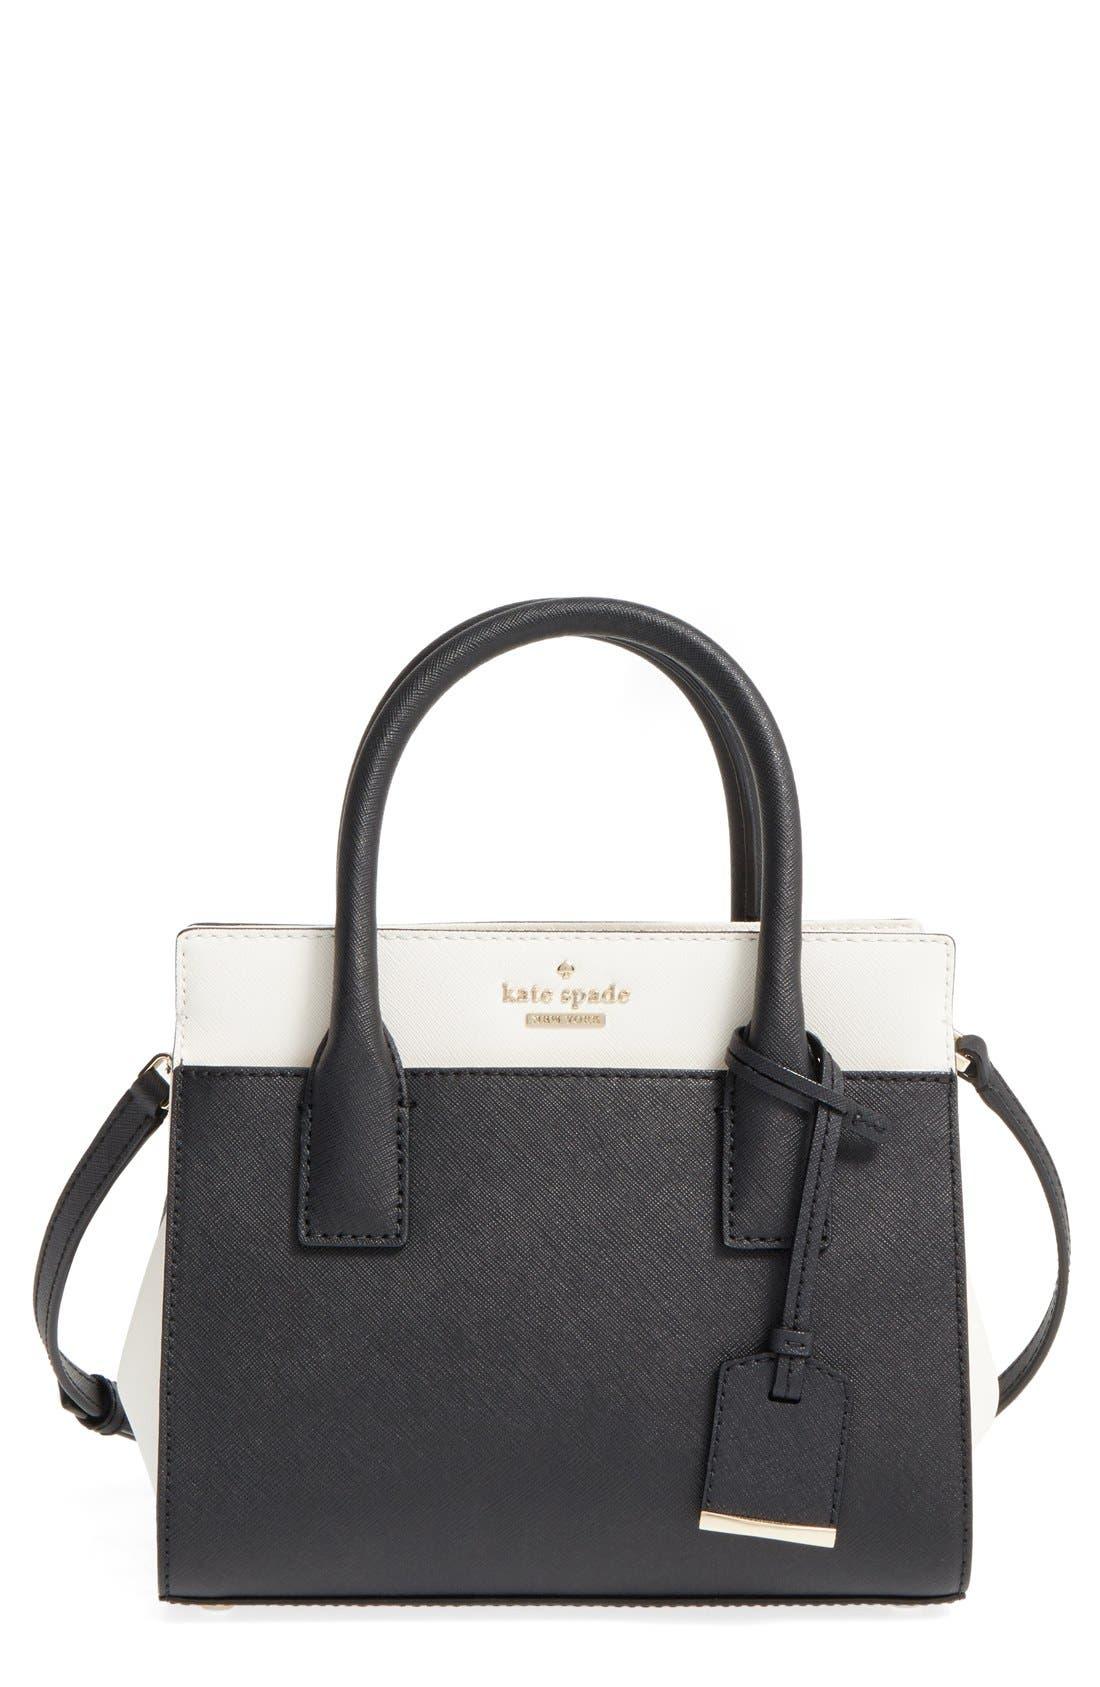 'cameron street - mini candace' leather satchel,                             Main thumbnail 1, color,                             Black/ Cement